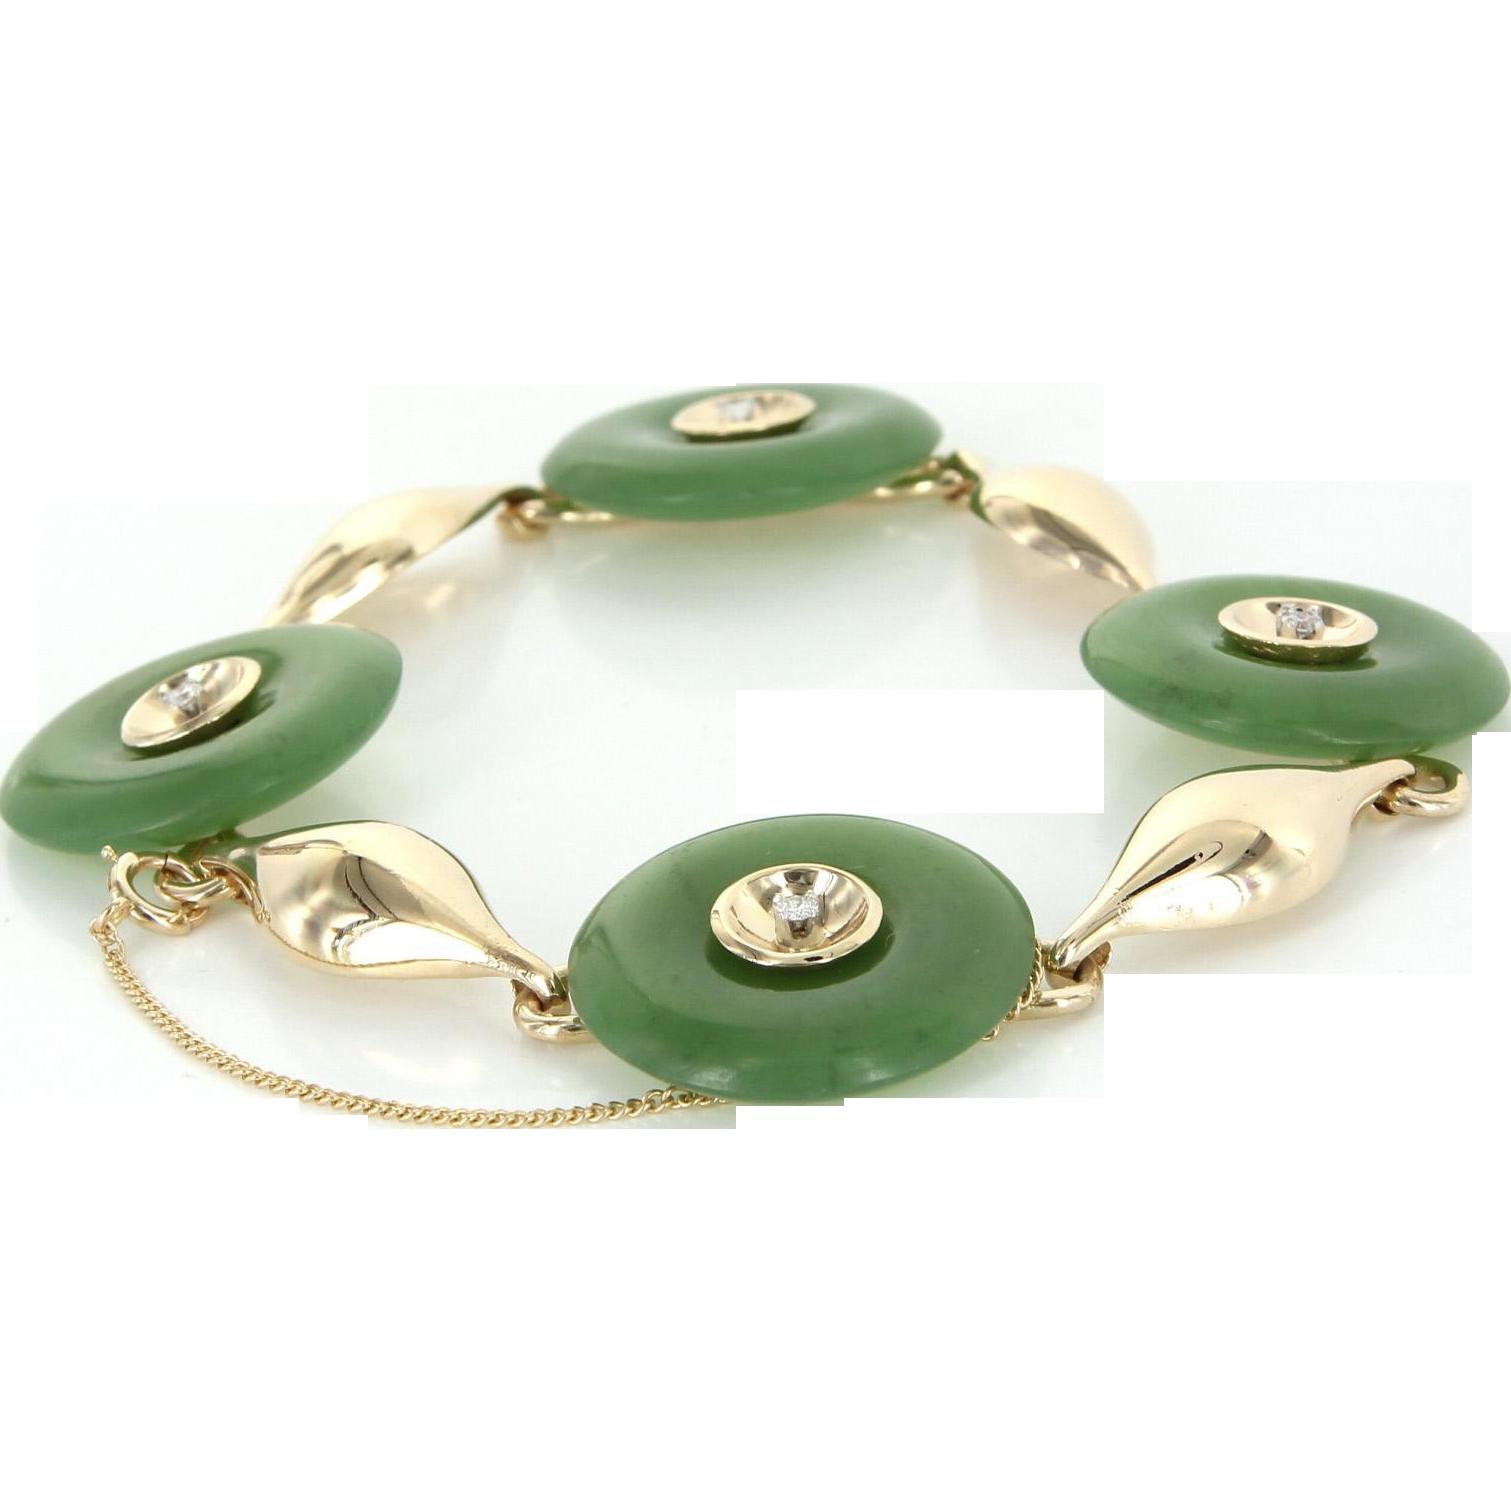 Vintage Jade Disc Diamond Bracelet 14 Karat Yellow Gold Estate Fine Jewelry Heirloom